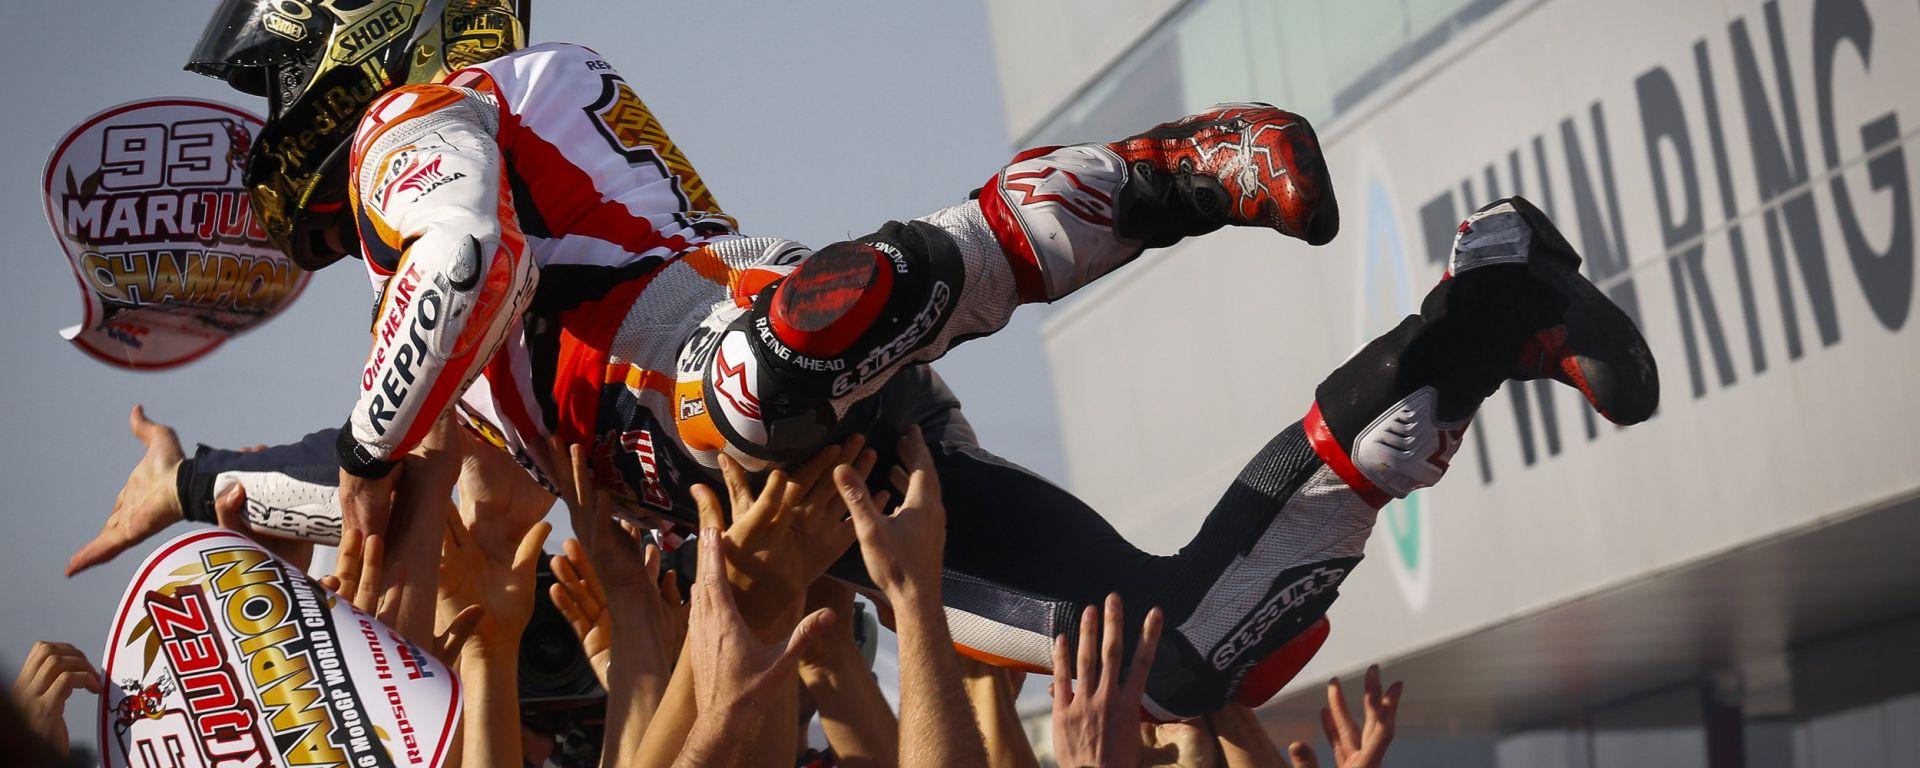 Give me five: Marc Marquez si laurea Campione del Mondo a Motegi